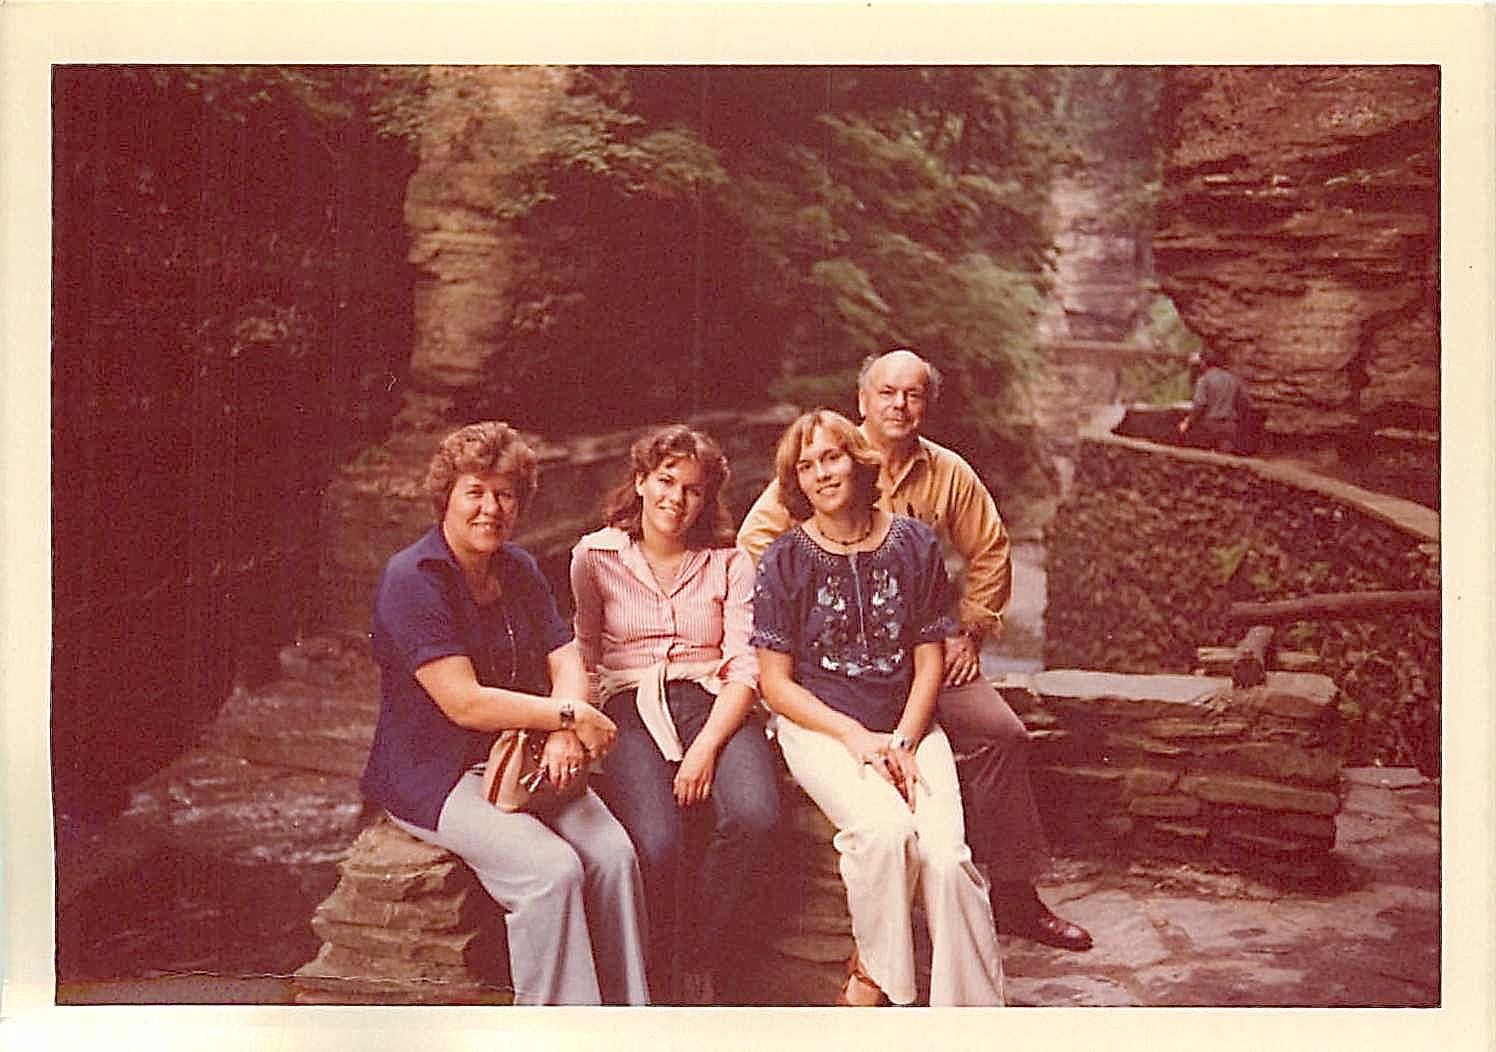 Summer 1977, Robert Treman State Park, NY, Eleanor, Celeste, Lorraine, Al Gudas